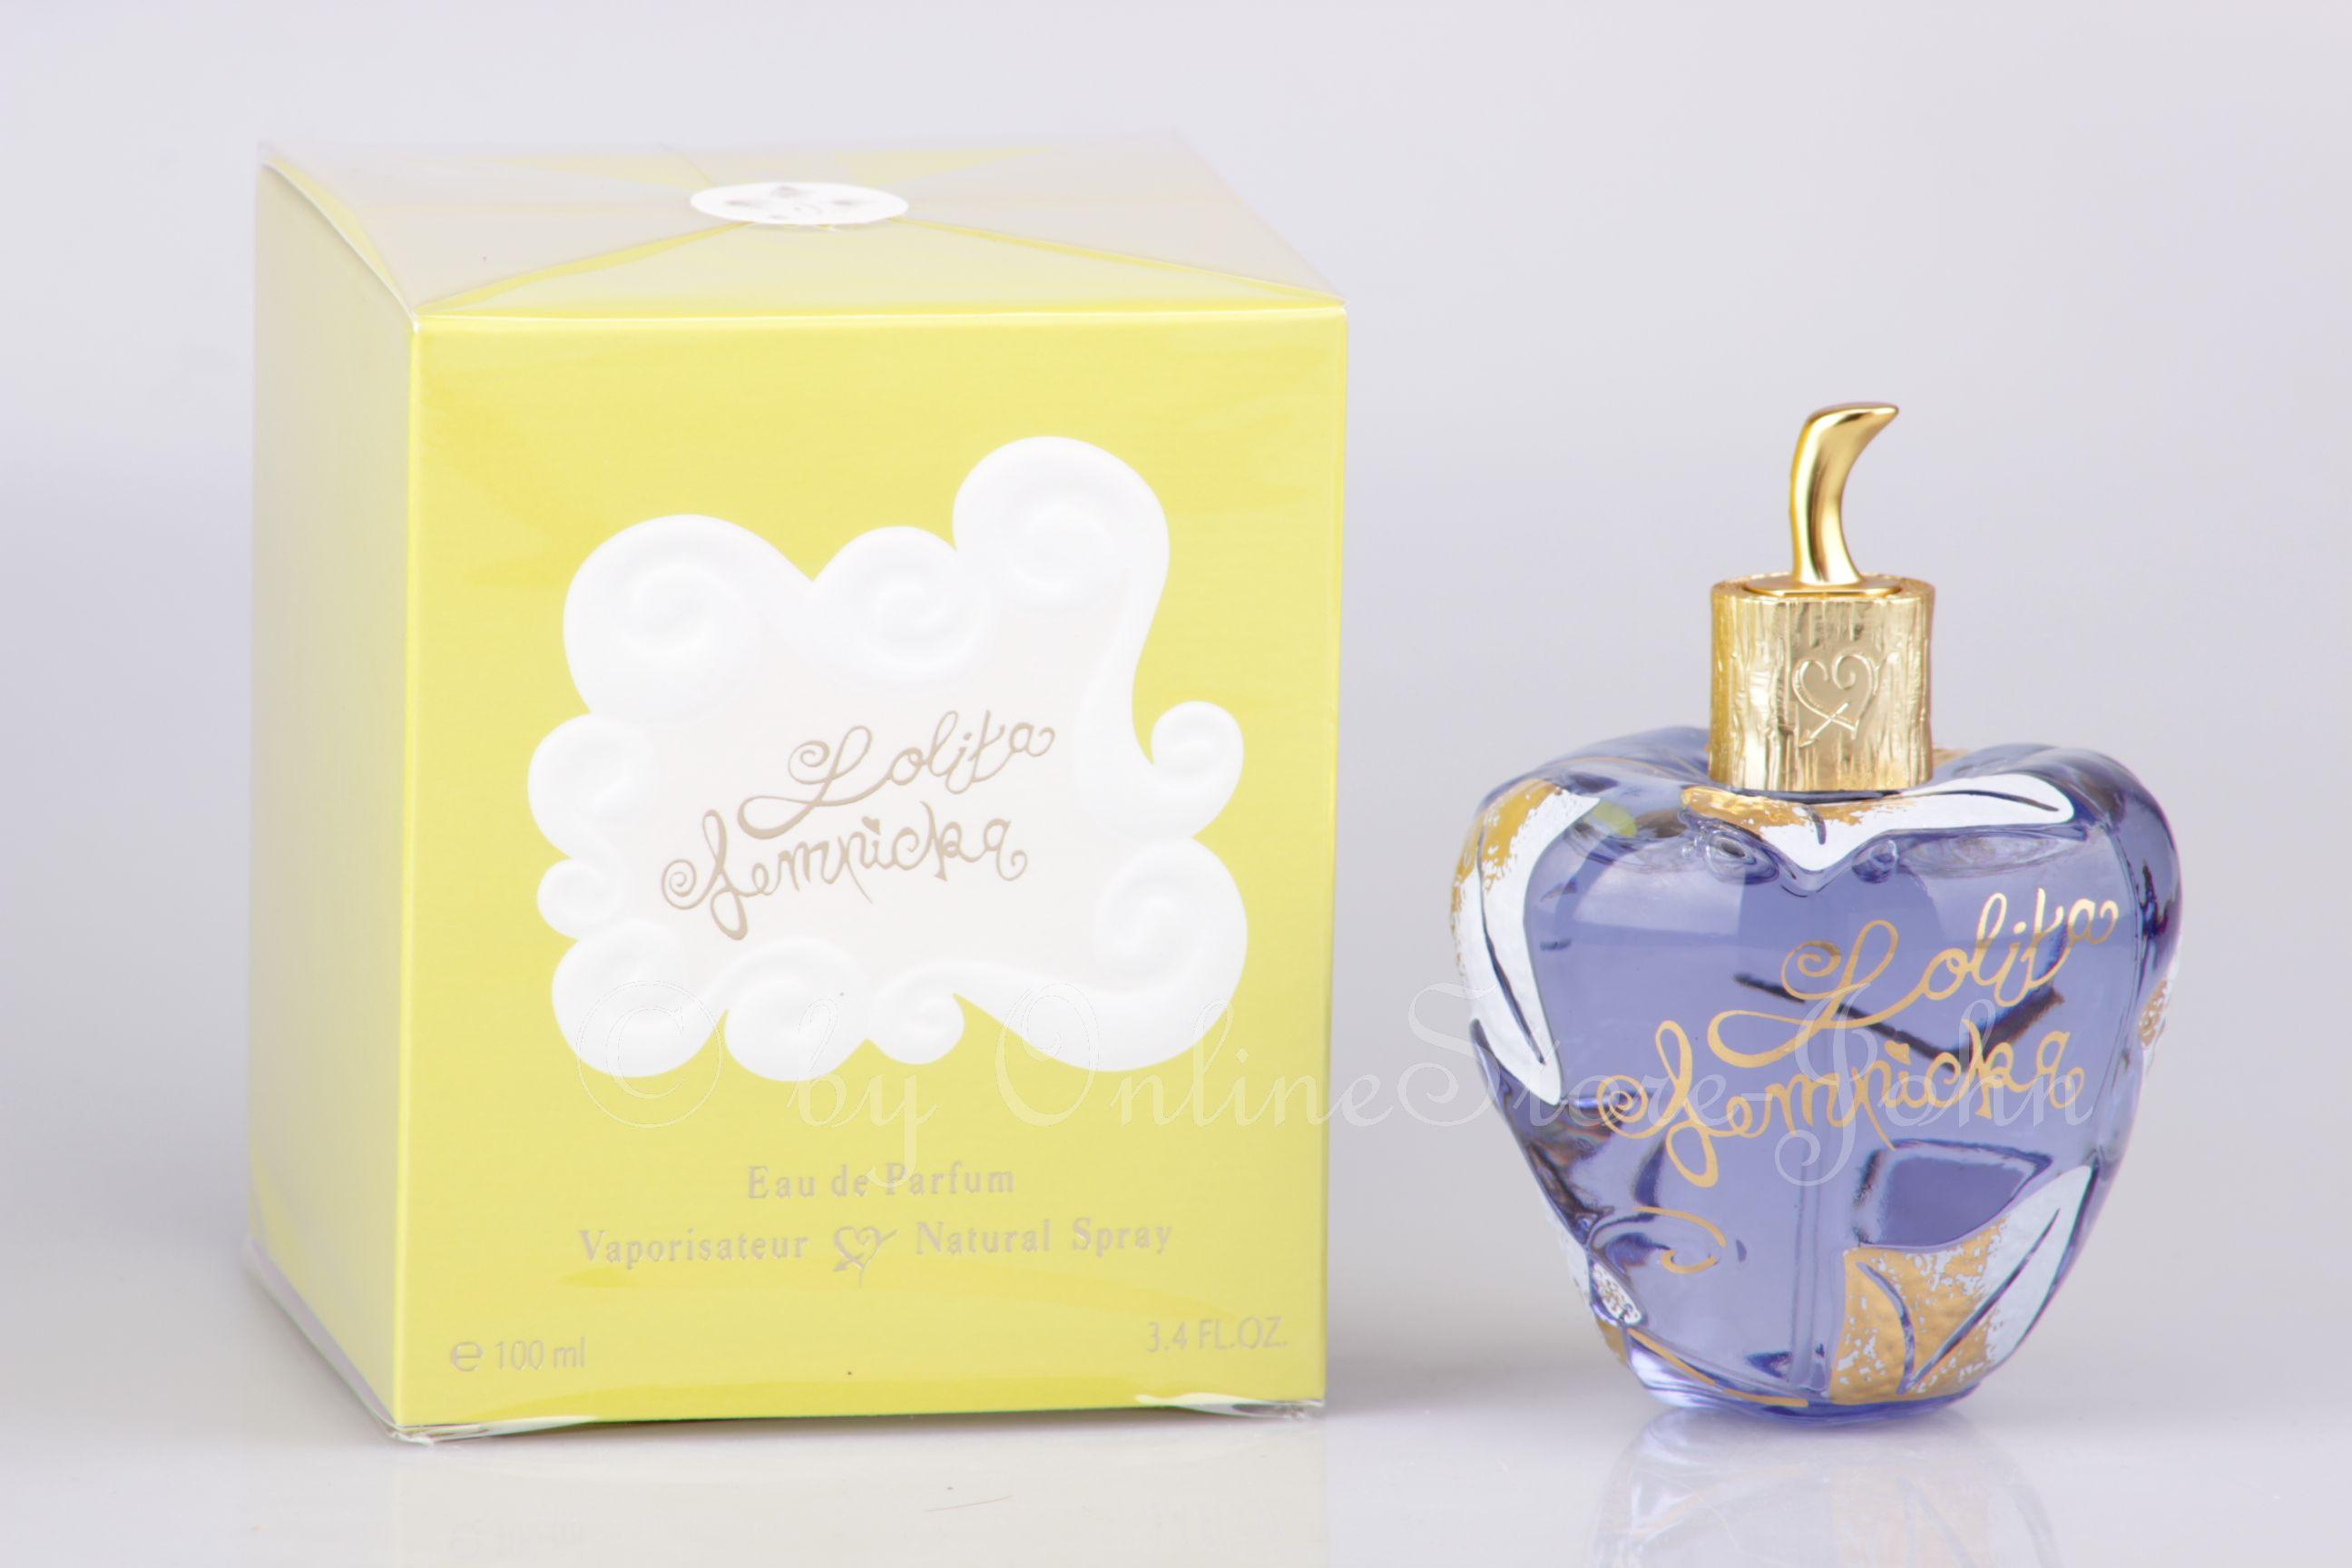 lolita lempicka au feminin le premier perfume 100 ml edp nip 3595200501015 ebay. Black Bedroom Furniture Sets. Home Design Ideas